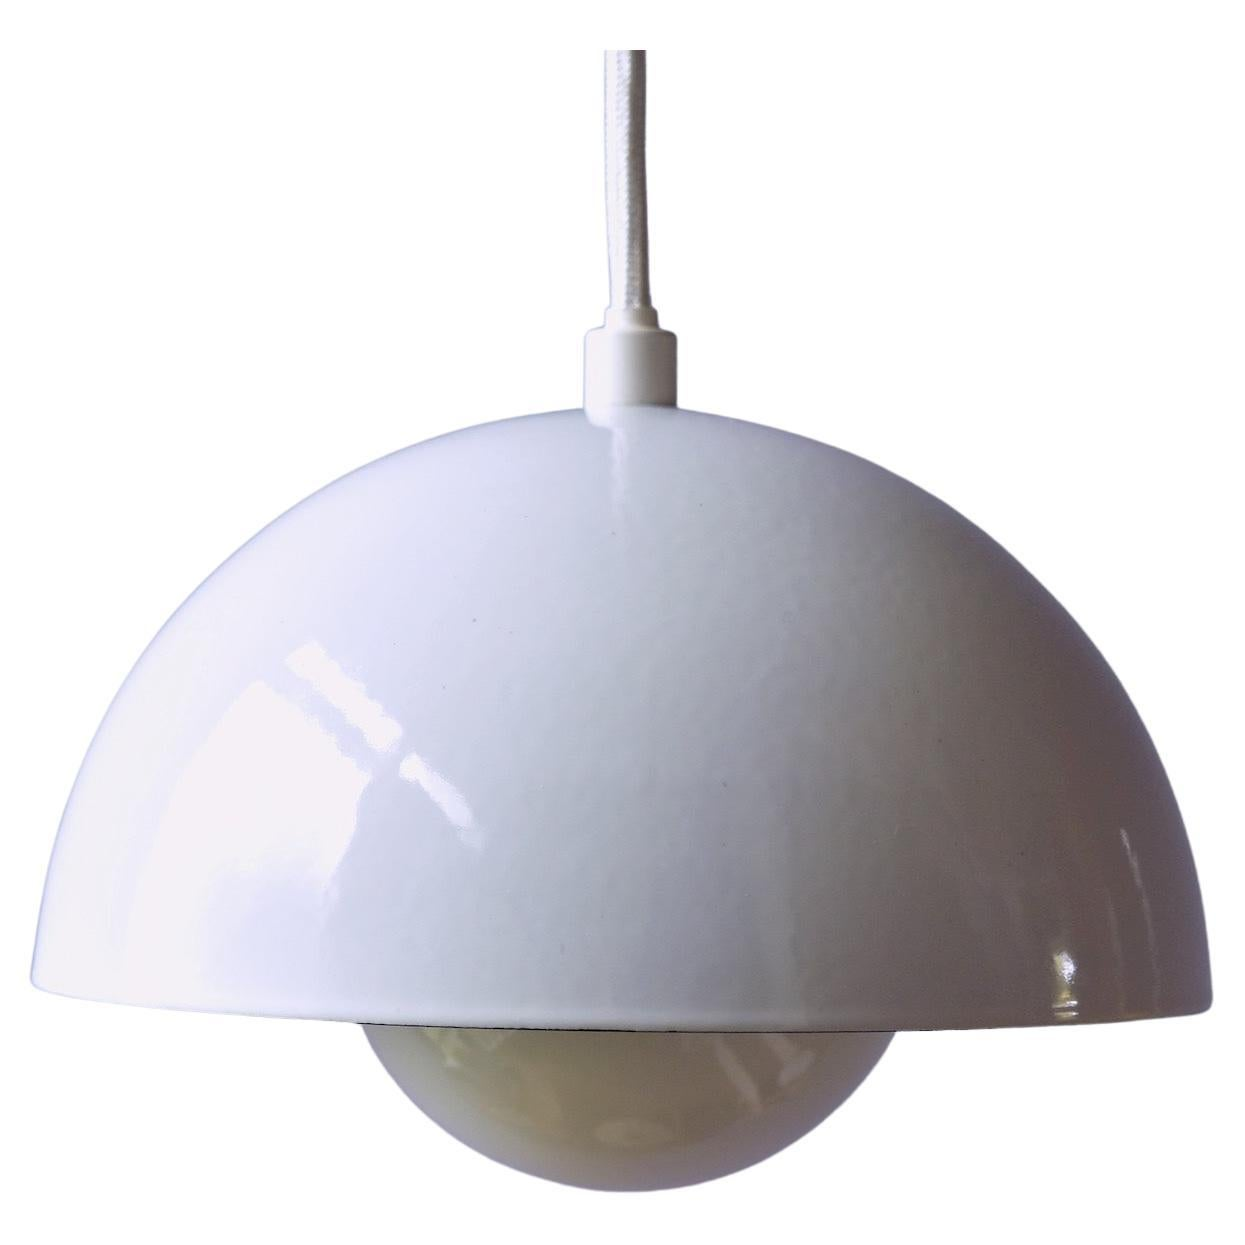 Vintage Verner Panton Enamel Flowerpot Pendant Lamp by Louis Poulsen, Denmark